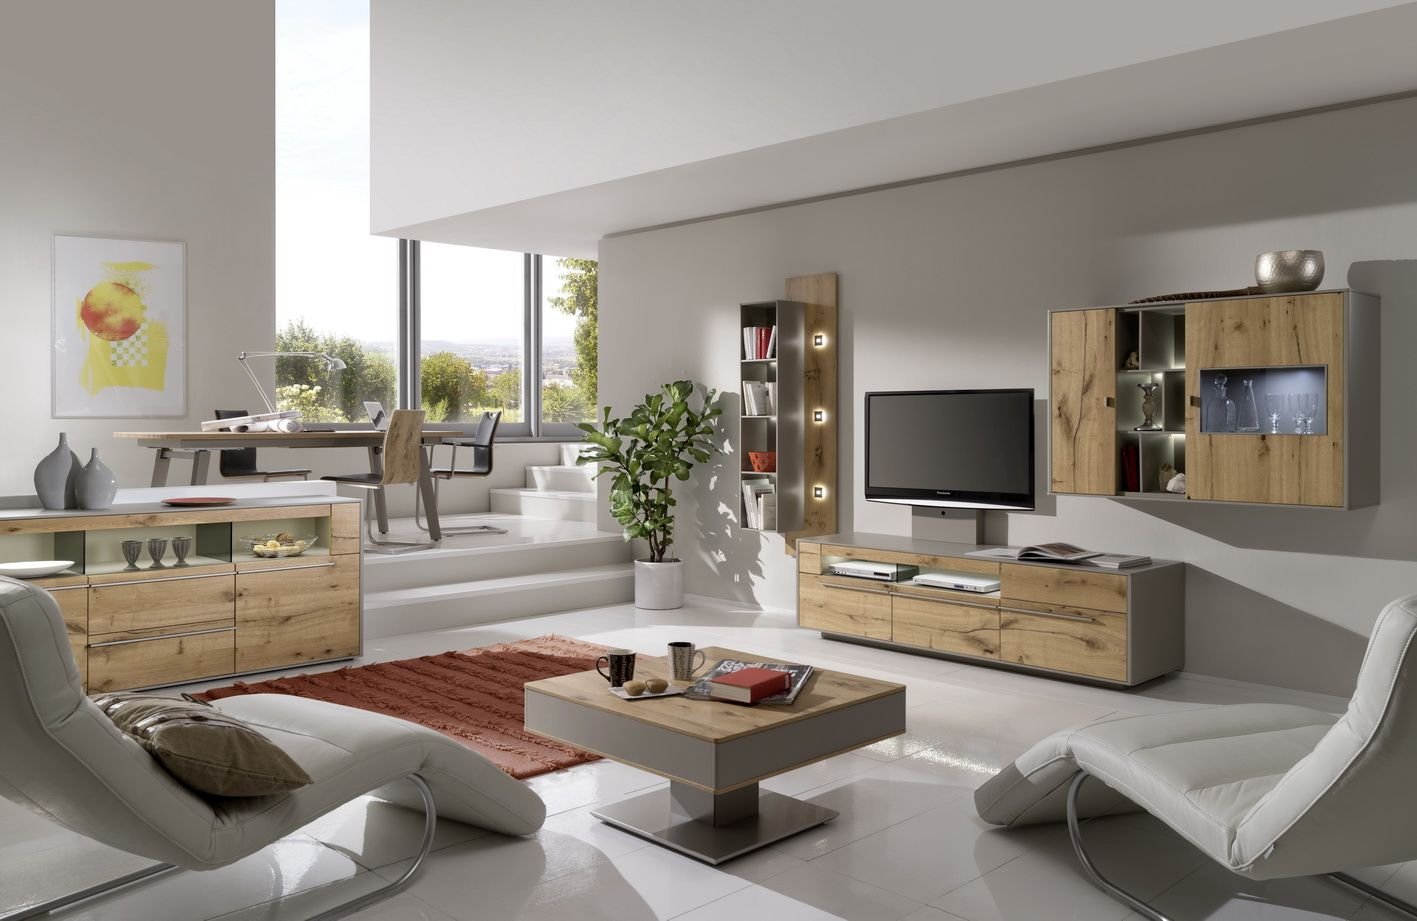 m bel madeingermany furniture gwinner wohndesign design wohnzimmer livingroom wallunit. Black Bedroom Furniture Sets. Home Design Ideas